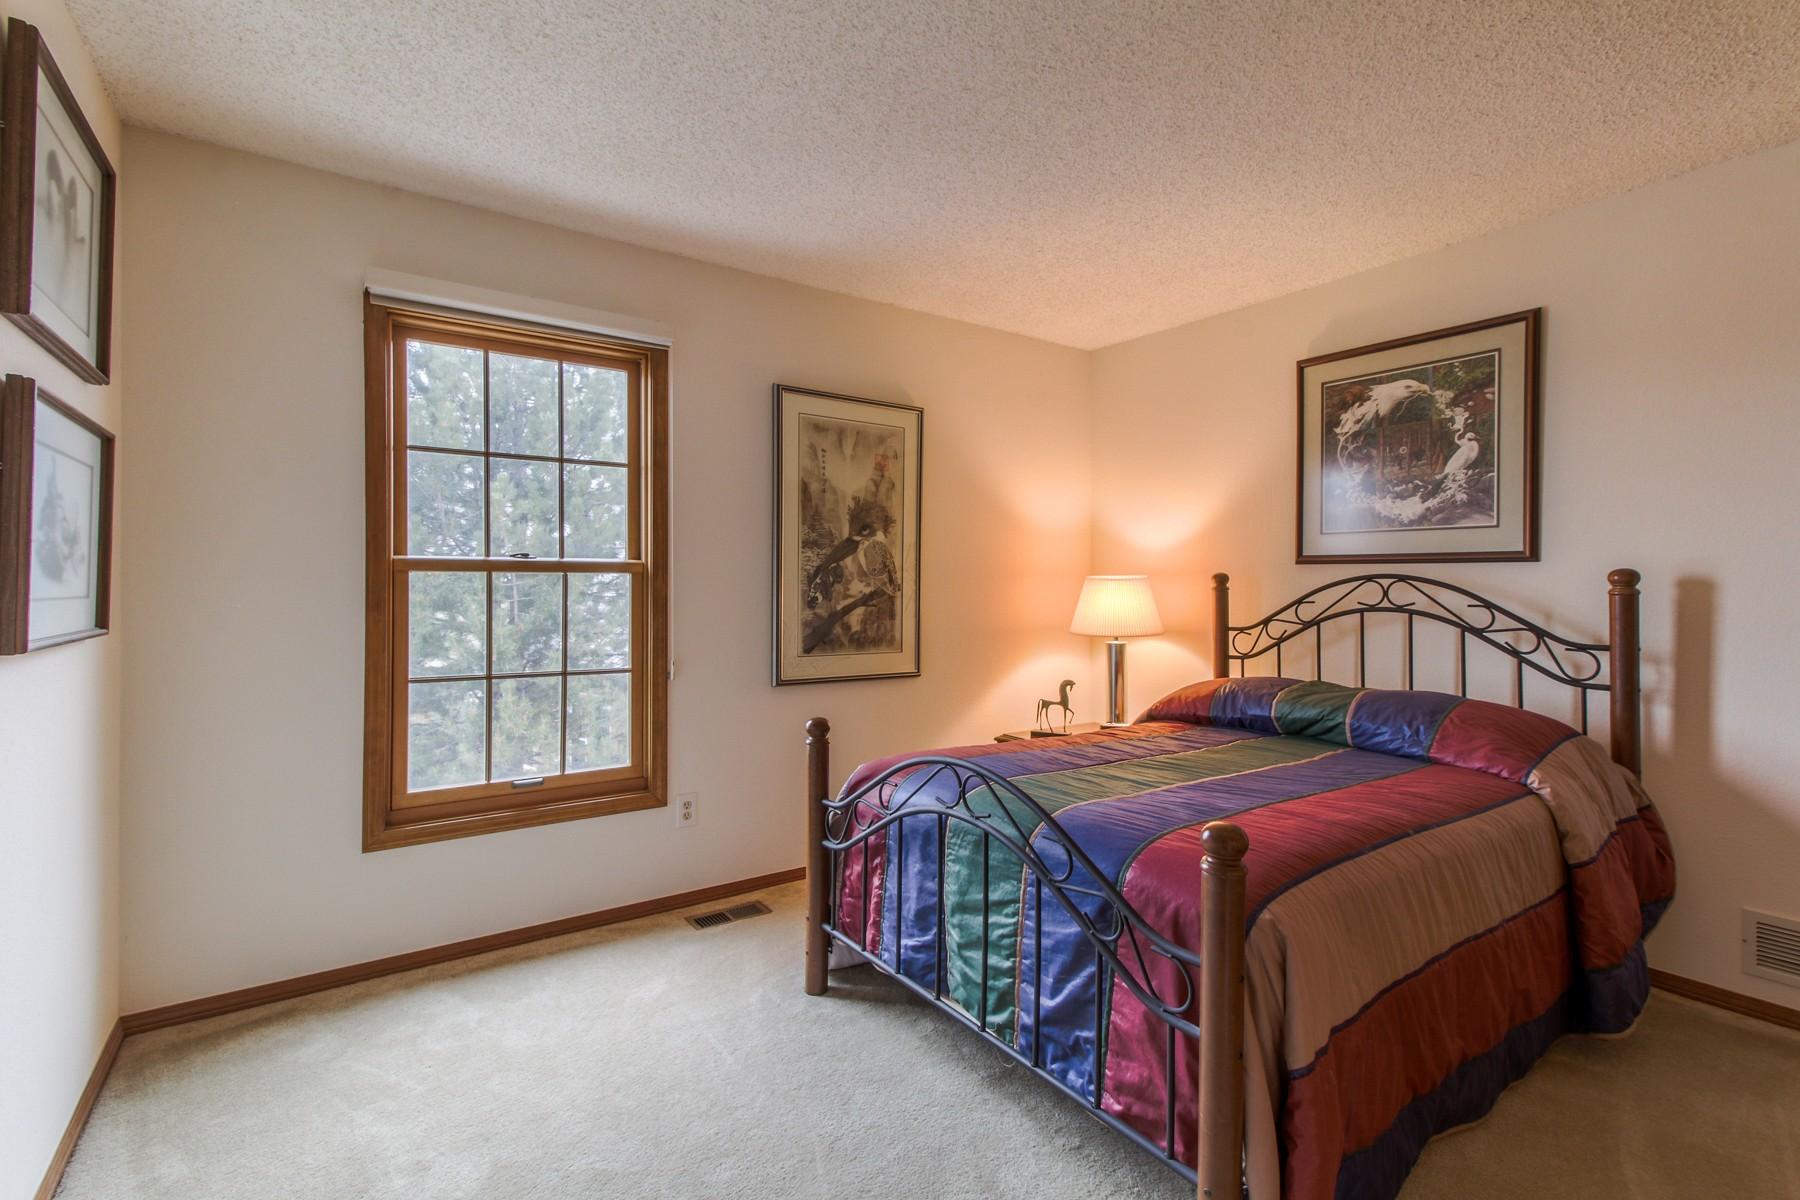 16697 East Prentice Avenue, Centennial, CO 80015